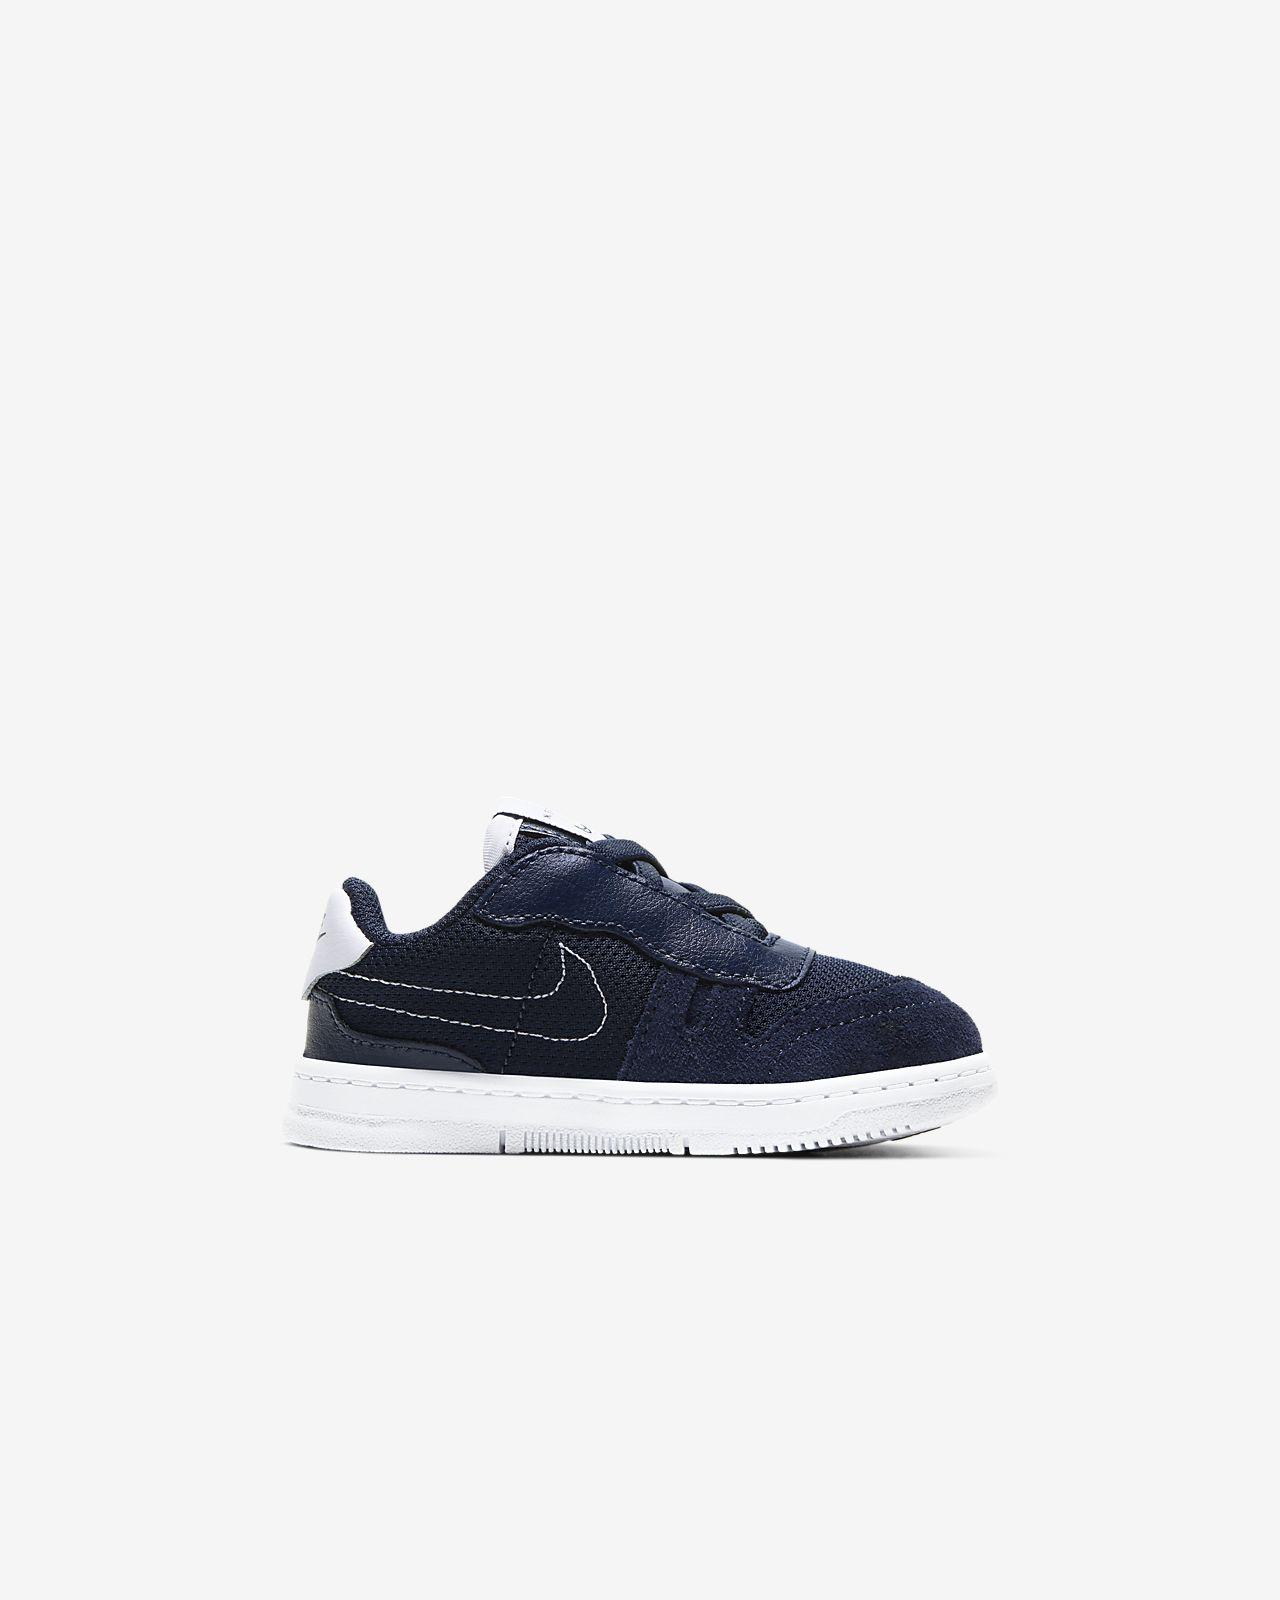 Nike squash type sko til babyersmåbørn